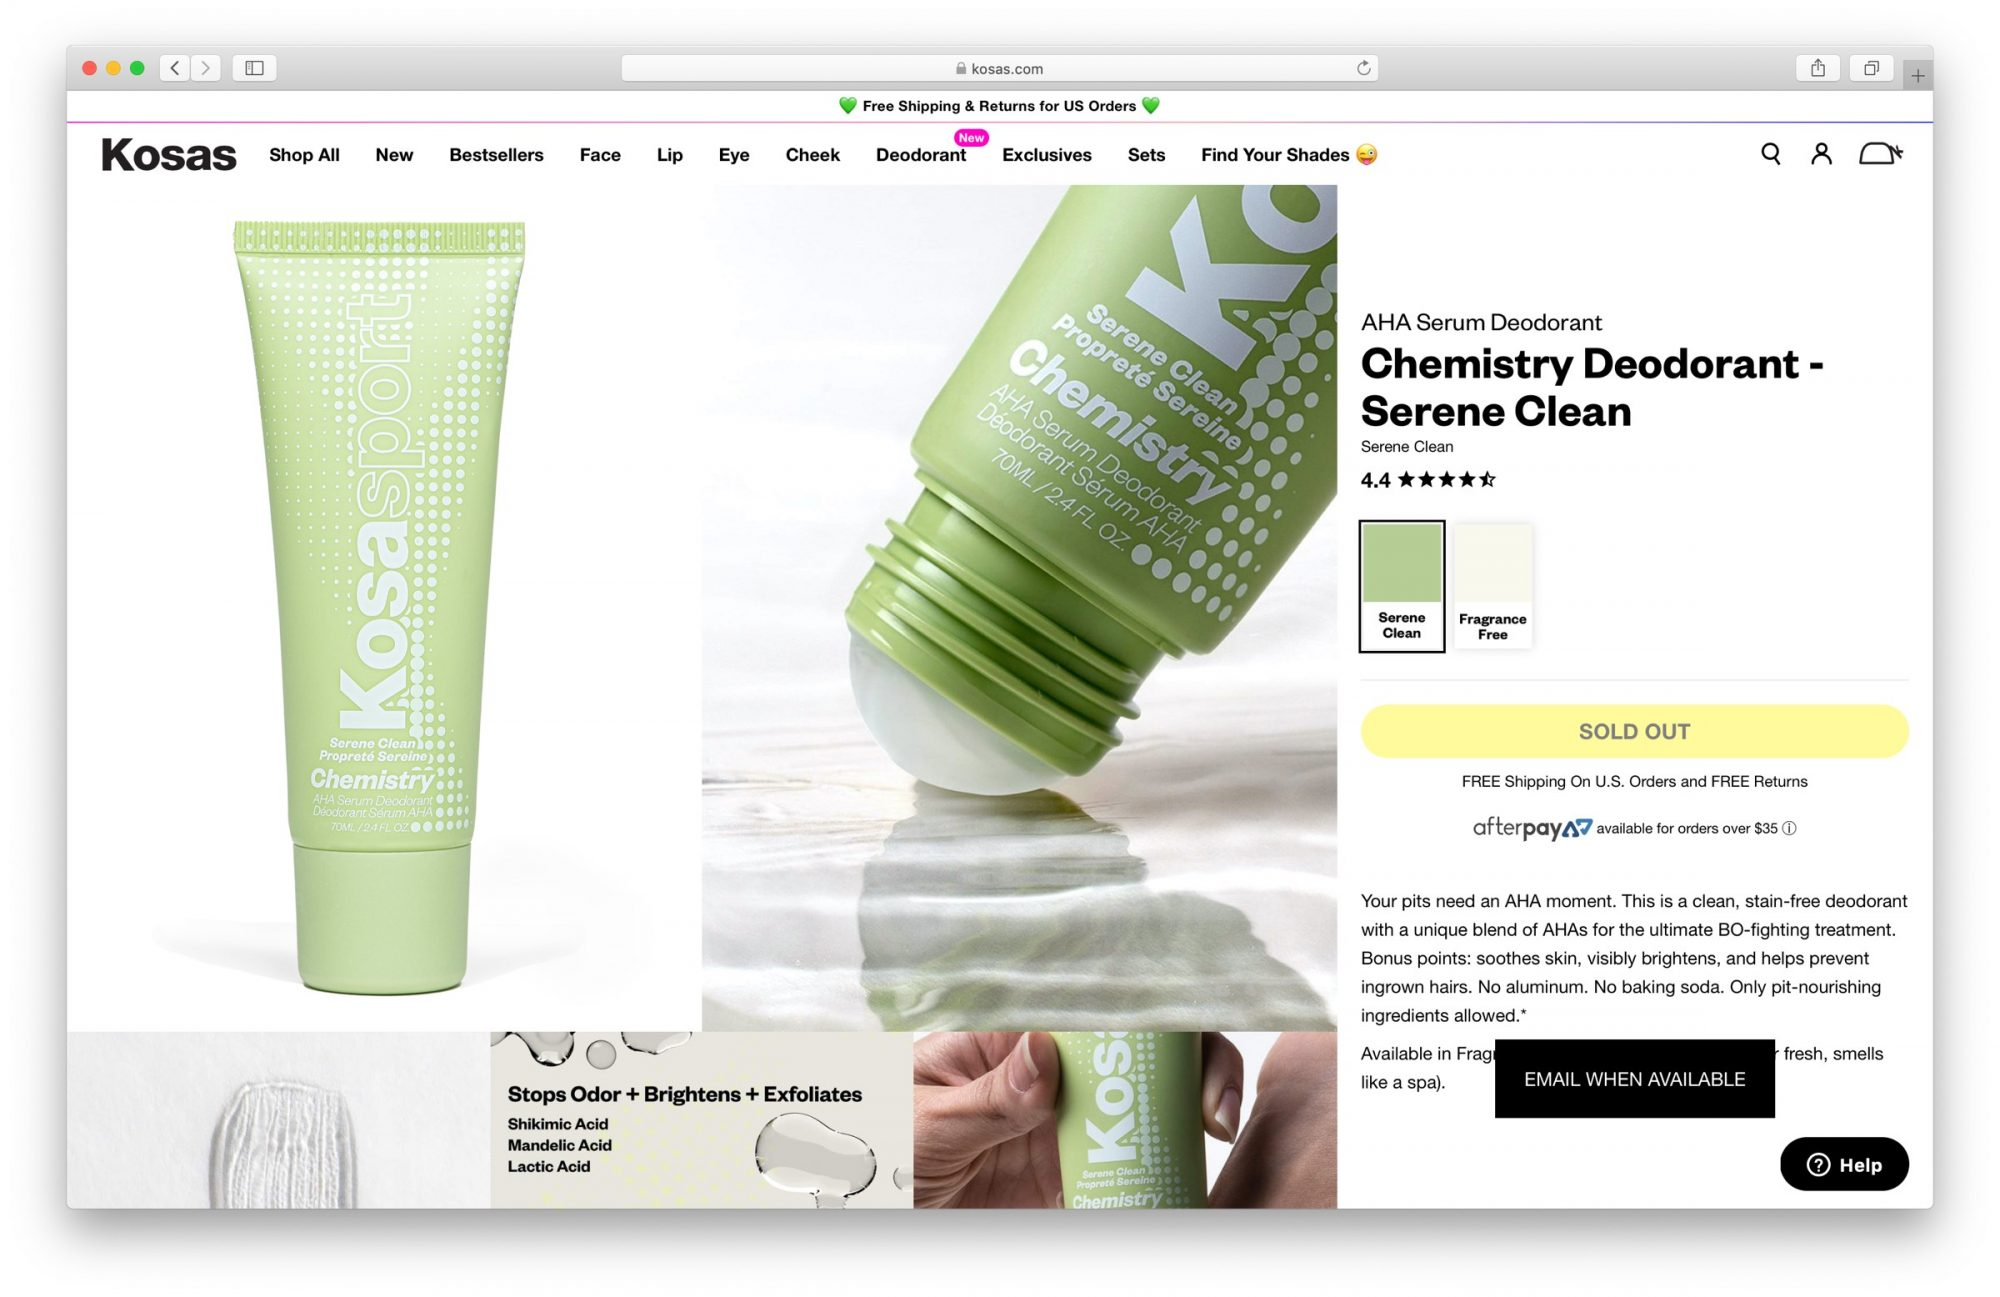 Kosas deodorant website